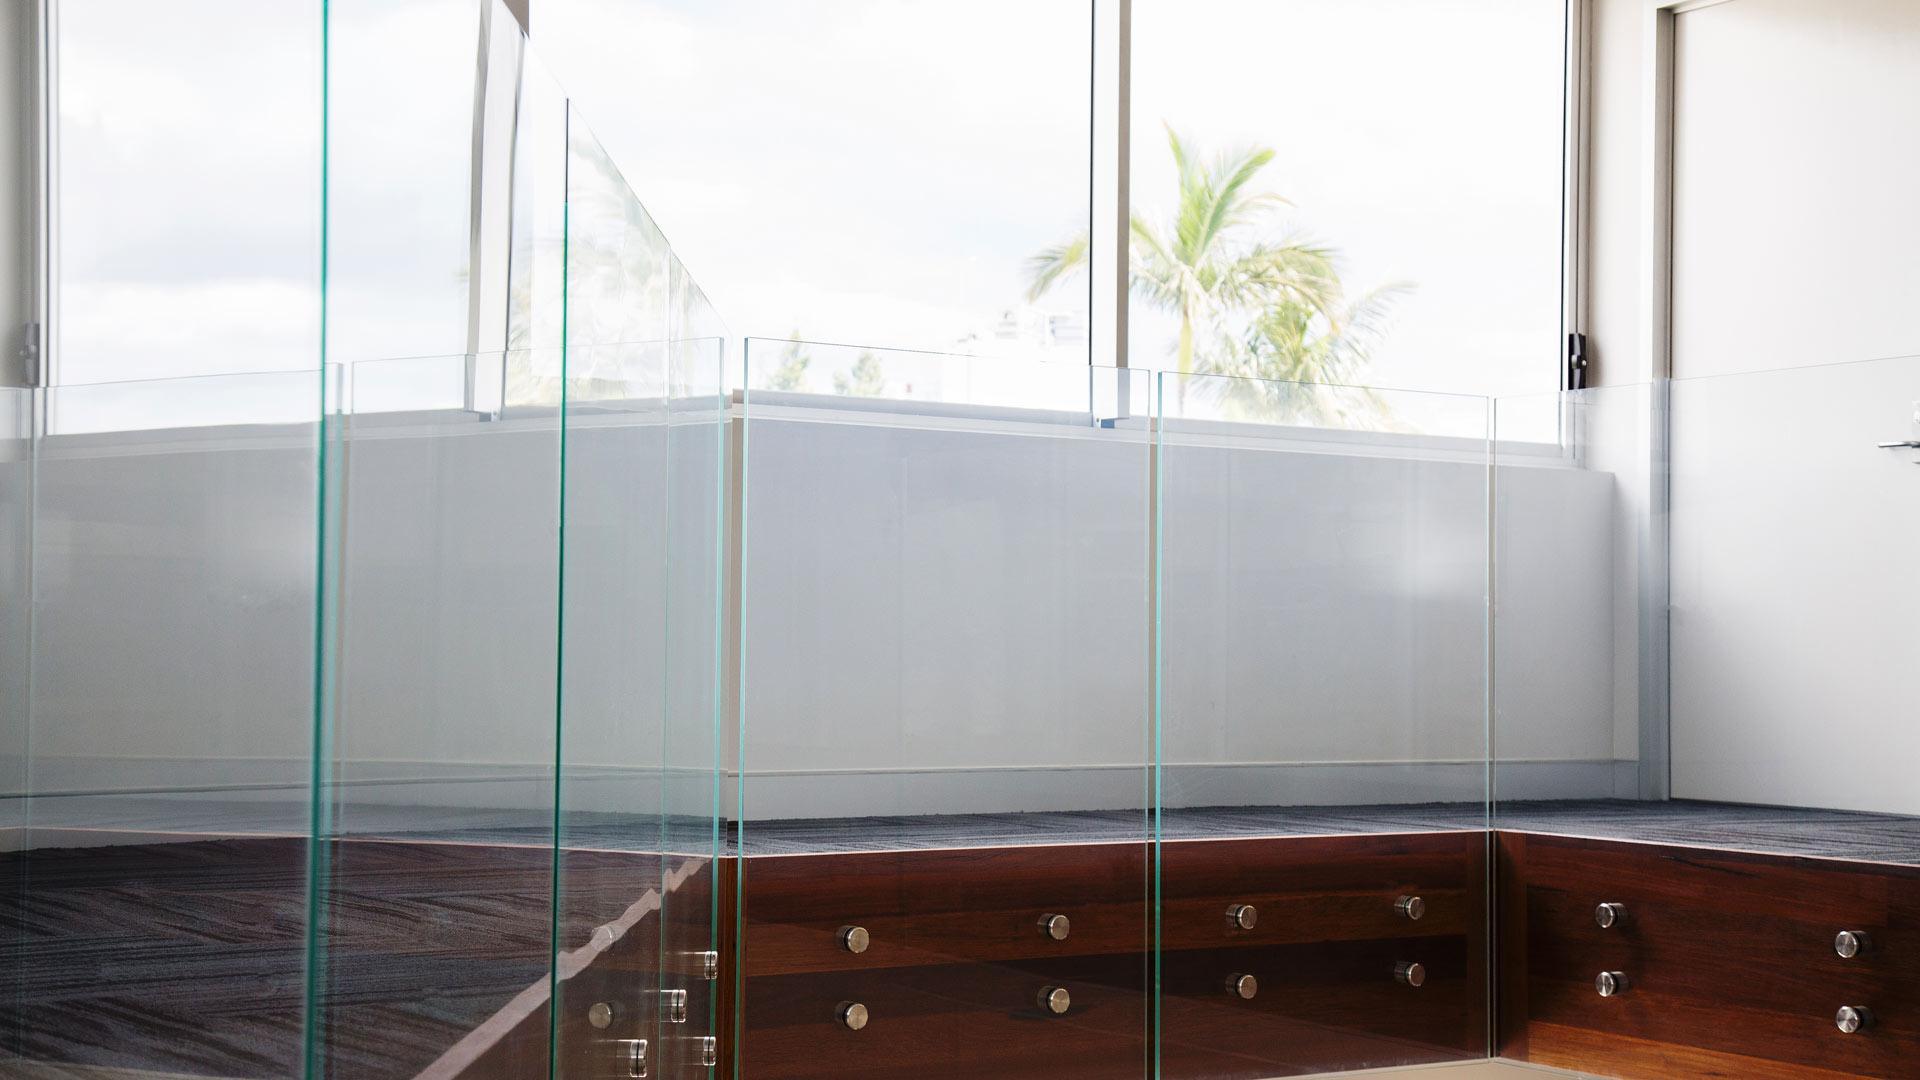 balustrading laminate, laminate safety glass, safety glazing, frameless safety glazing